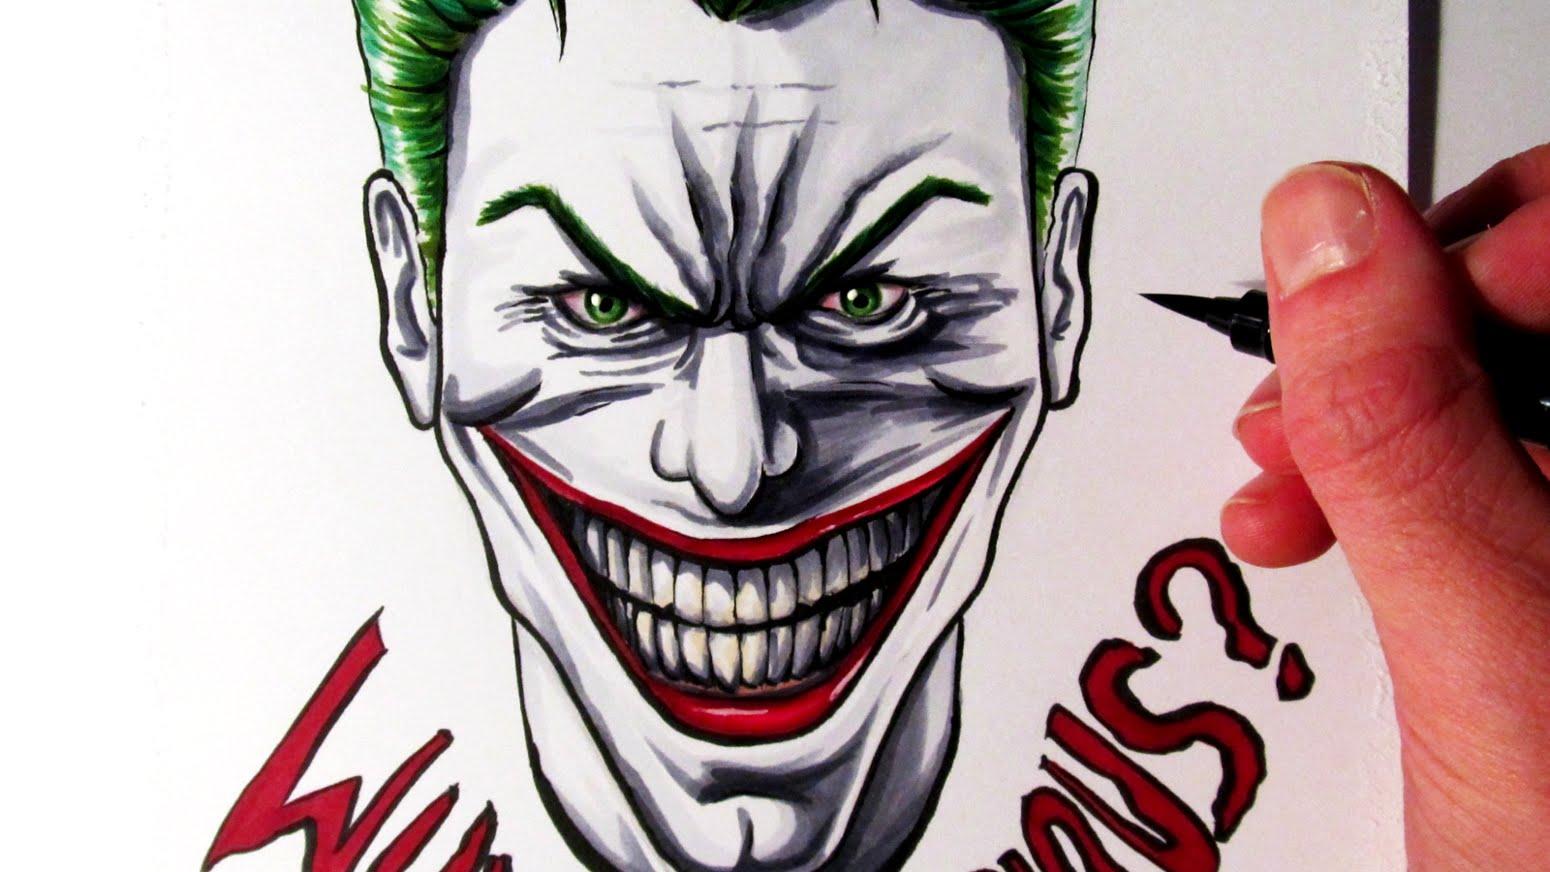 1550x872 Let's Draw The Joker